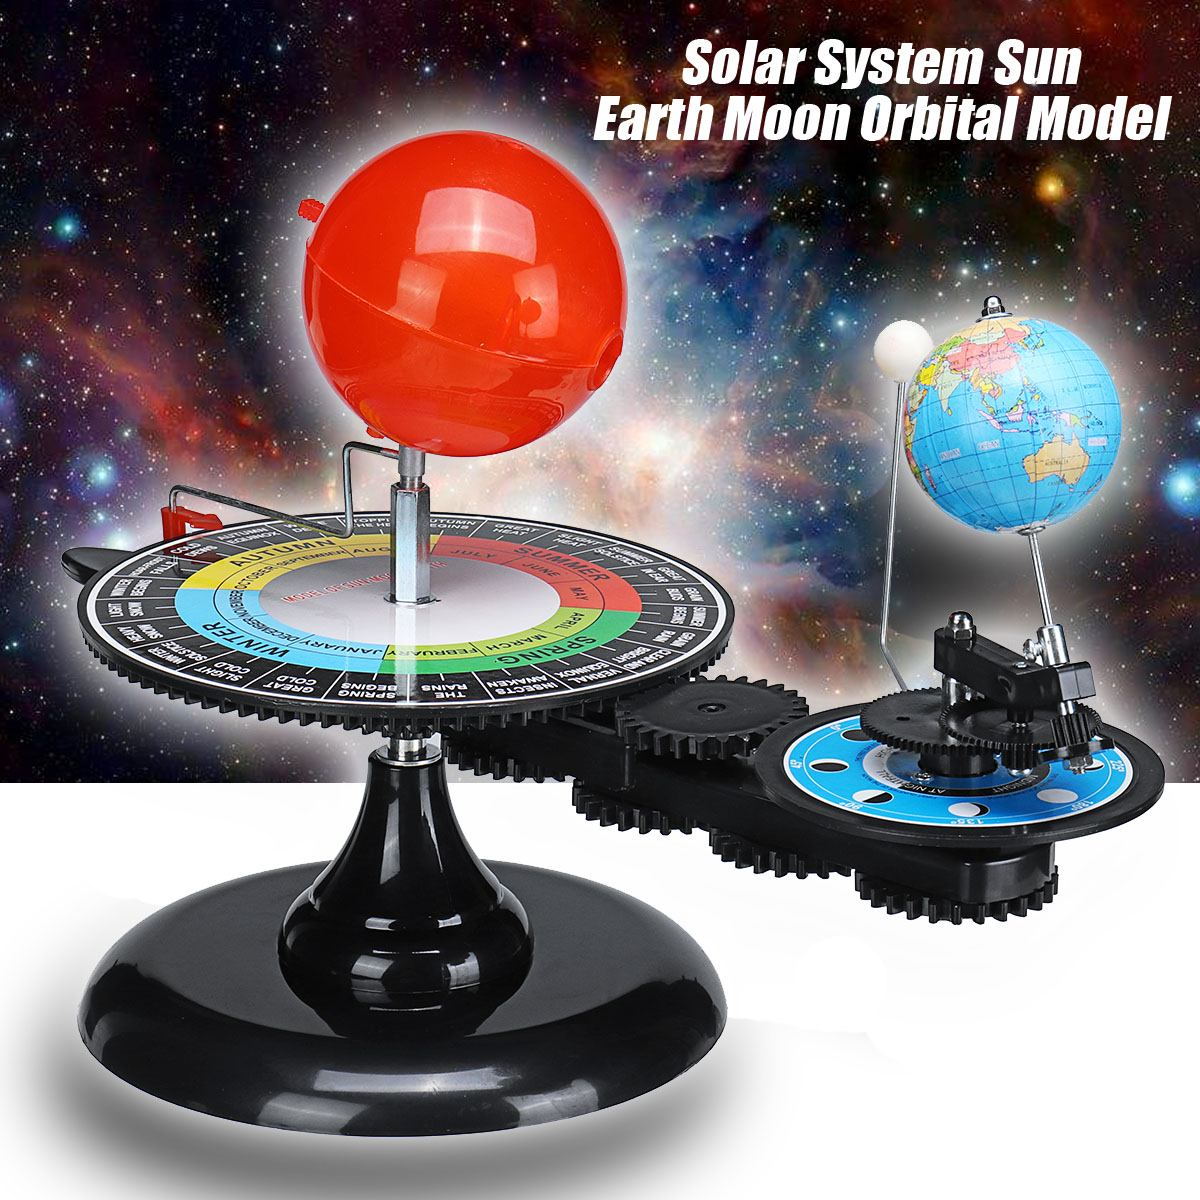 Solar System Globe Earth Sun Moon Orbital Planetarium Model Educational for Children Toy Astronomy Science Kit Teaching Tool недорго, оригинальная цена